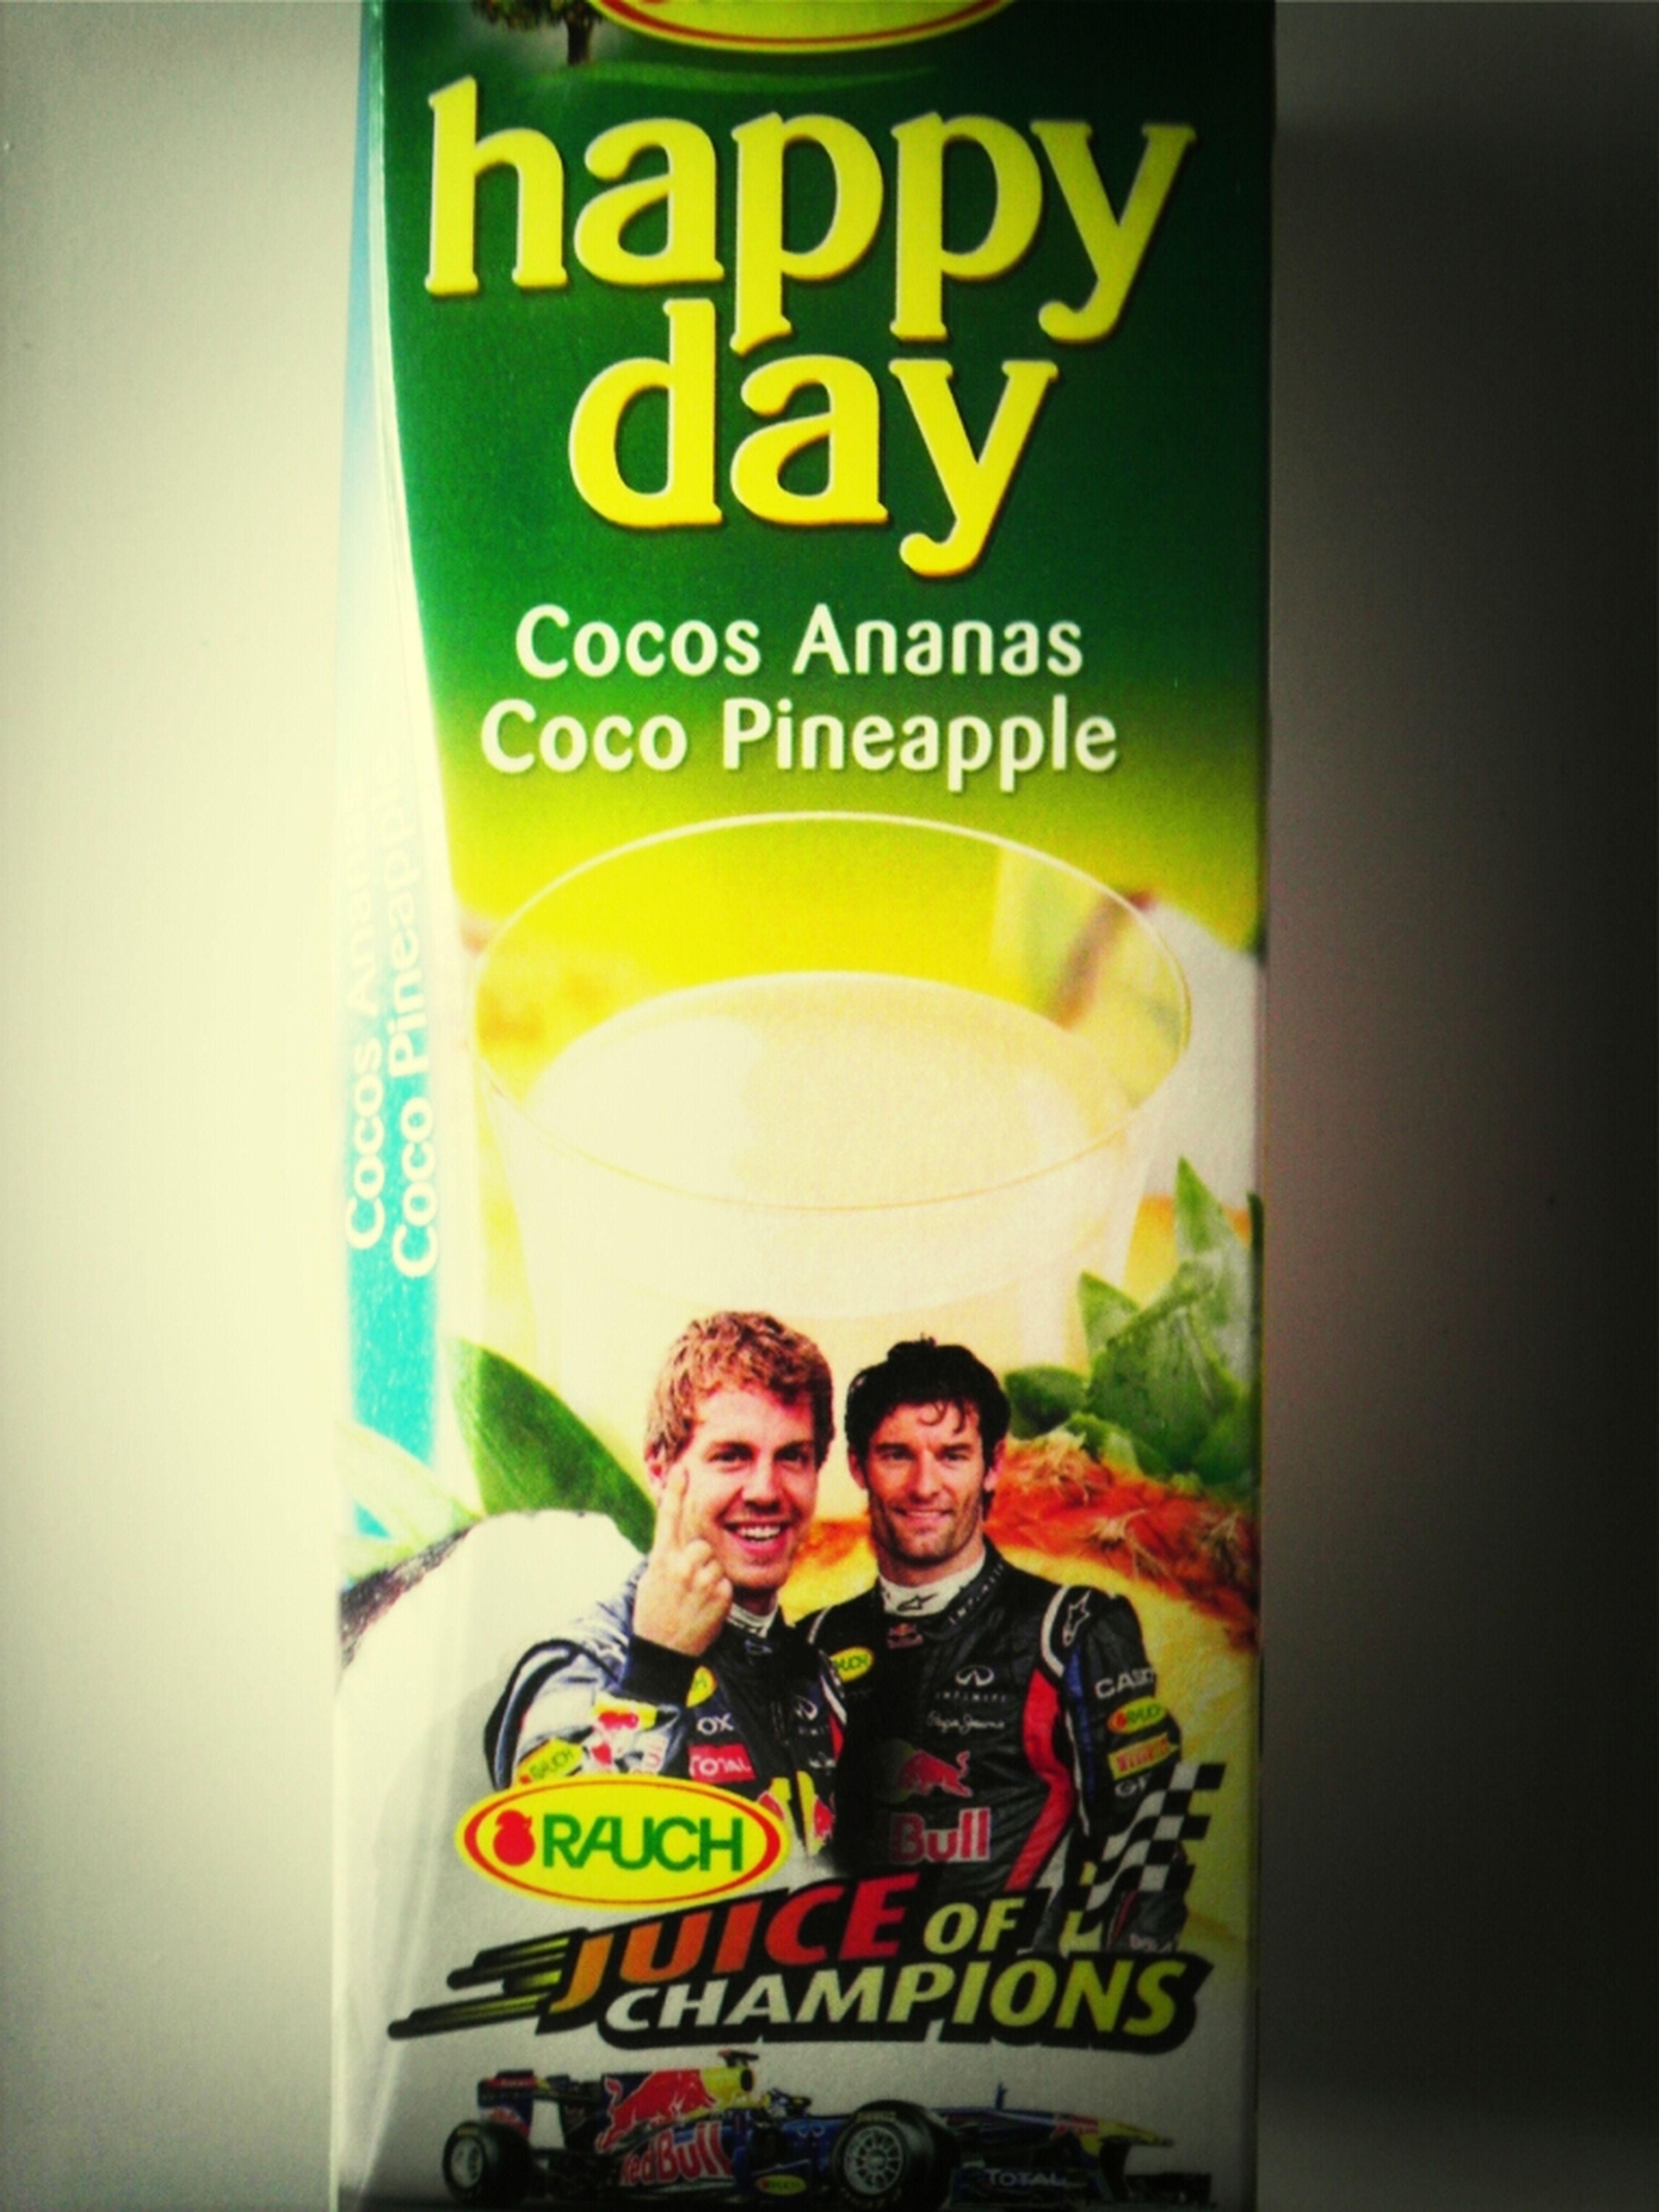 Happy Day:D German Groceries Juice Of Champions